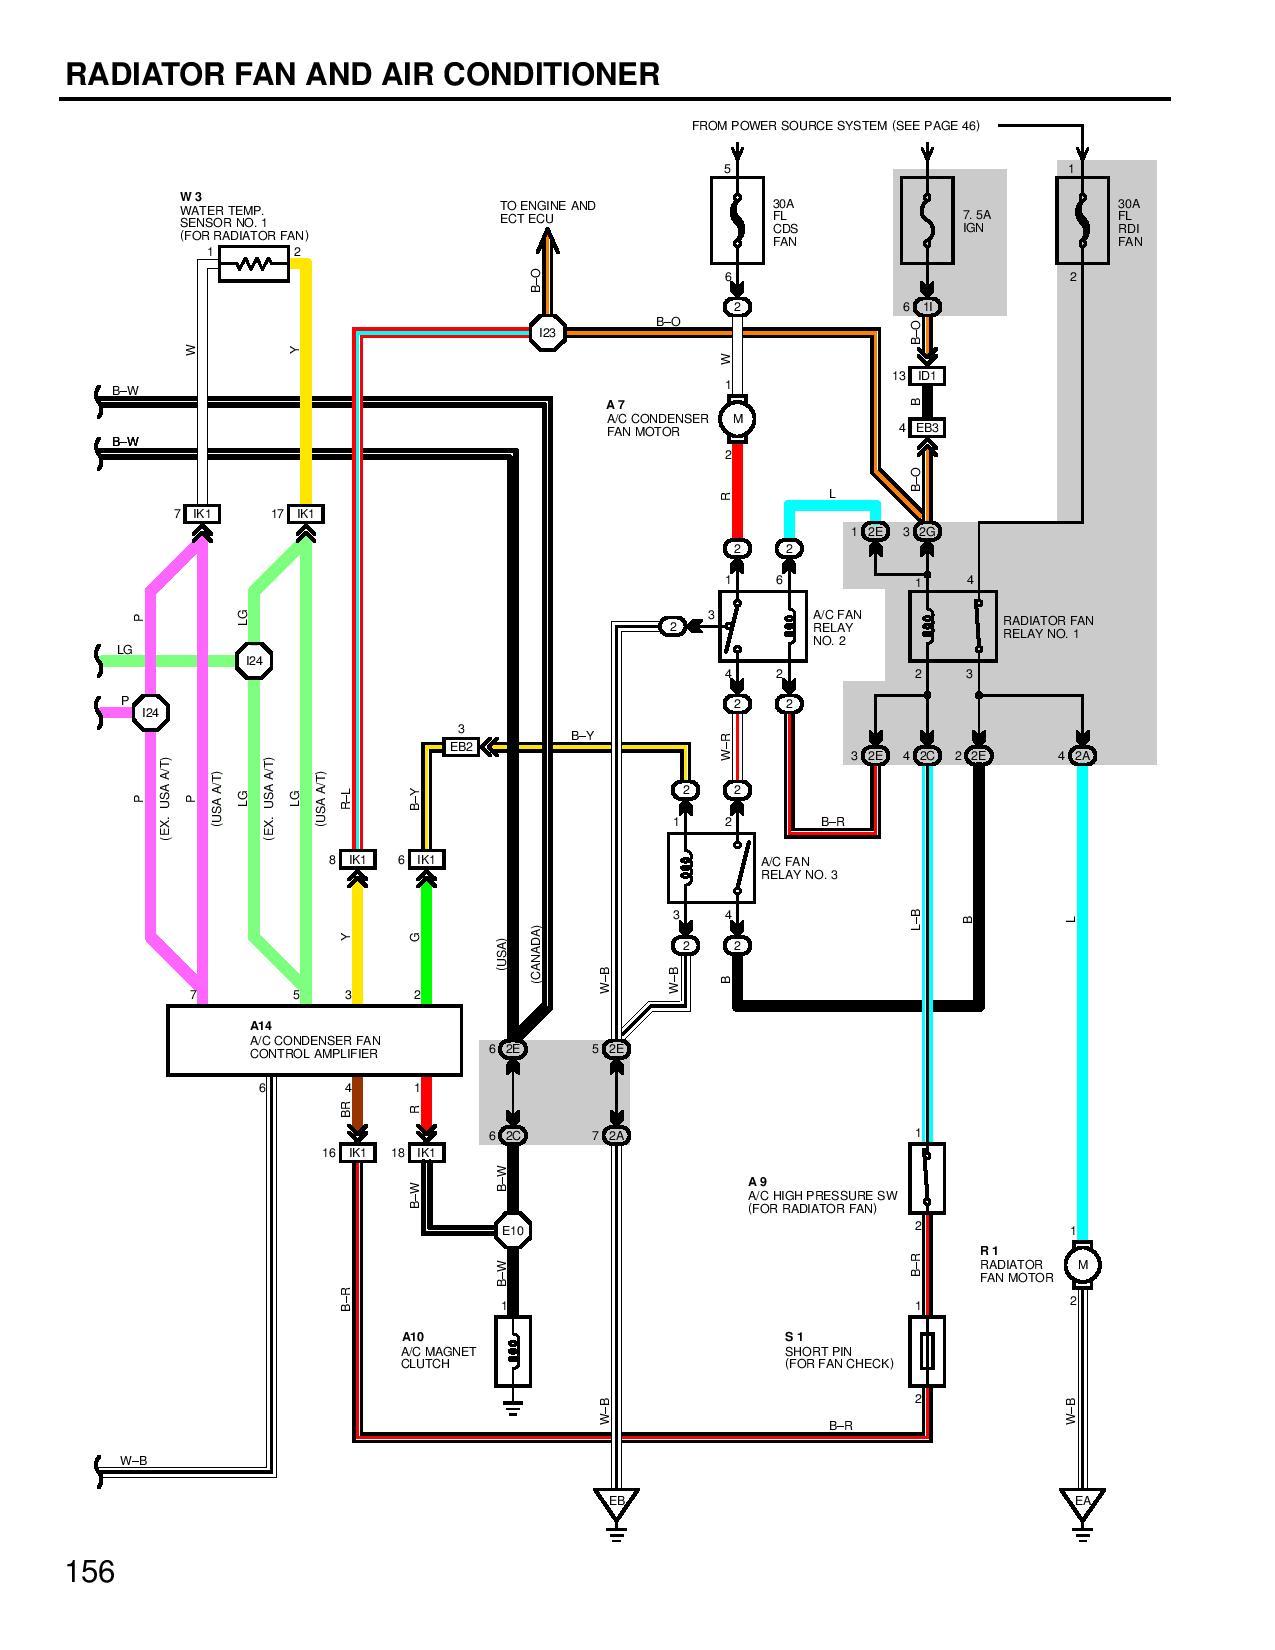 347375d1416429660 es 250 1991 wiring diagrams page 153?resize\\\\\\\\\\\\\\\=665%2C861\\\\\\\\\\\\\\\&ssl\\\\\\\\\\\\\\\=1 daihatsu mira l7 wiring diagram wiring library